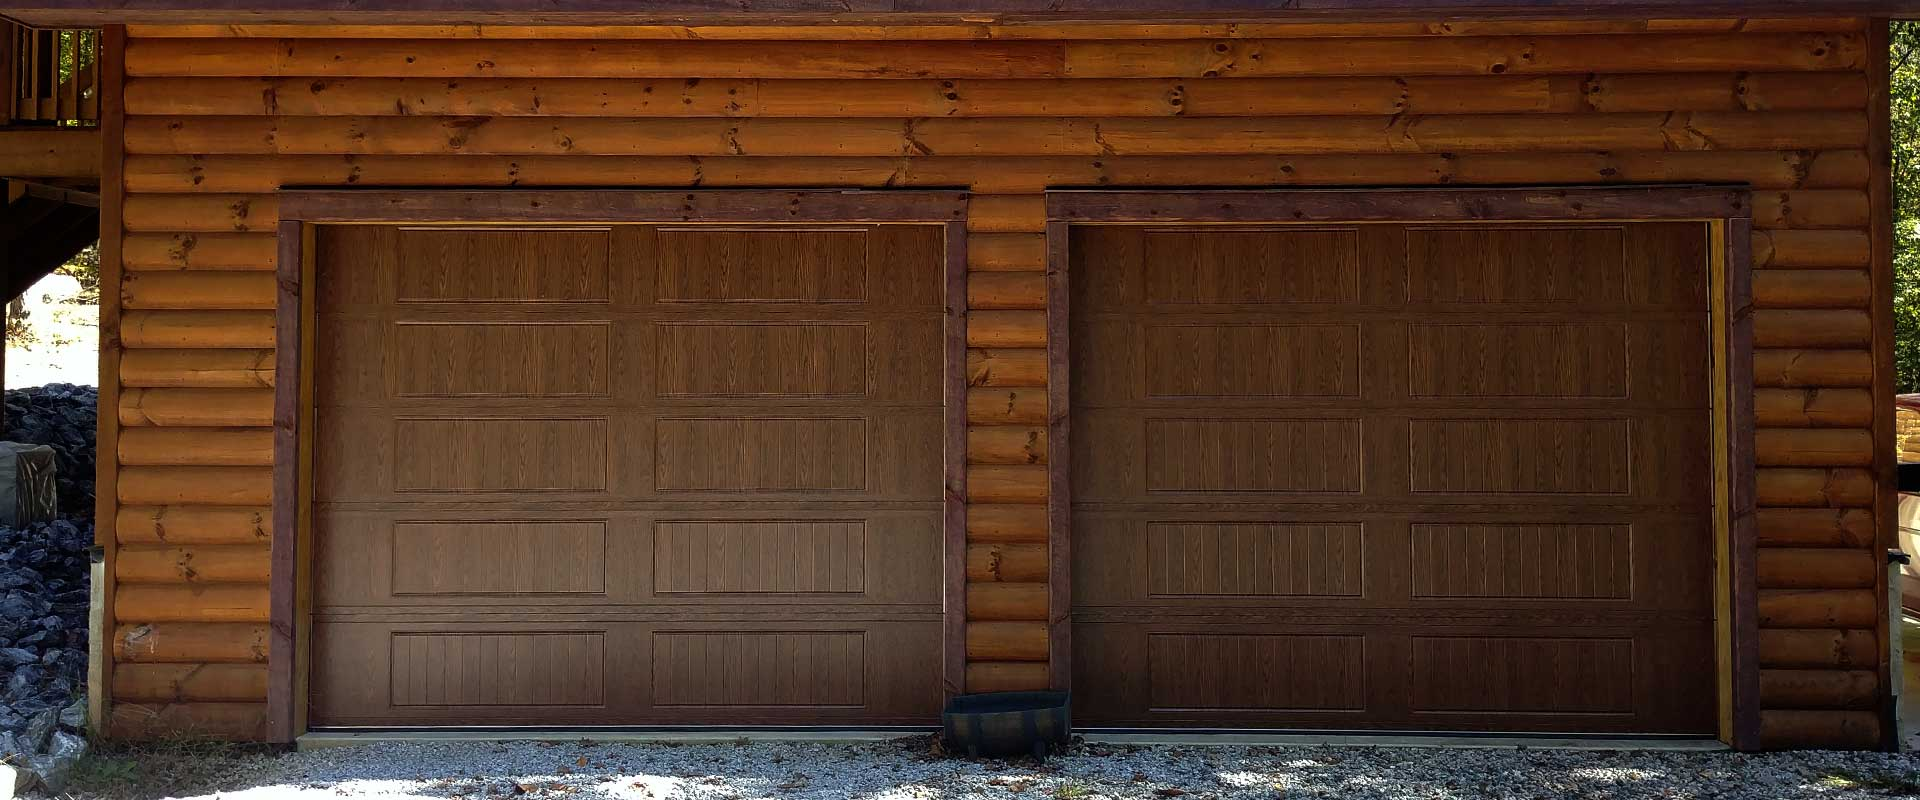 doors repair arbor mi tech garage near me door ann service star